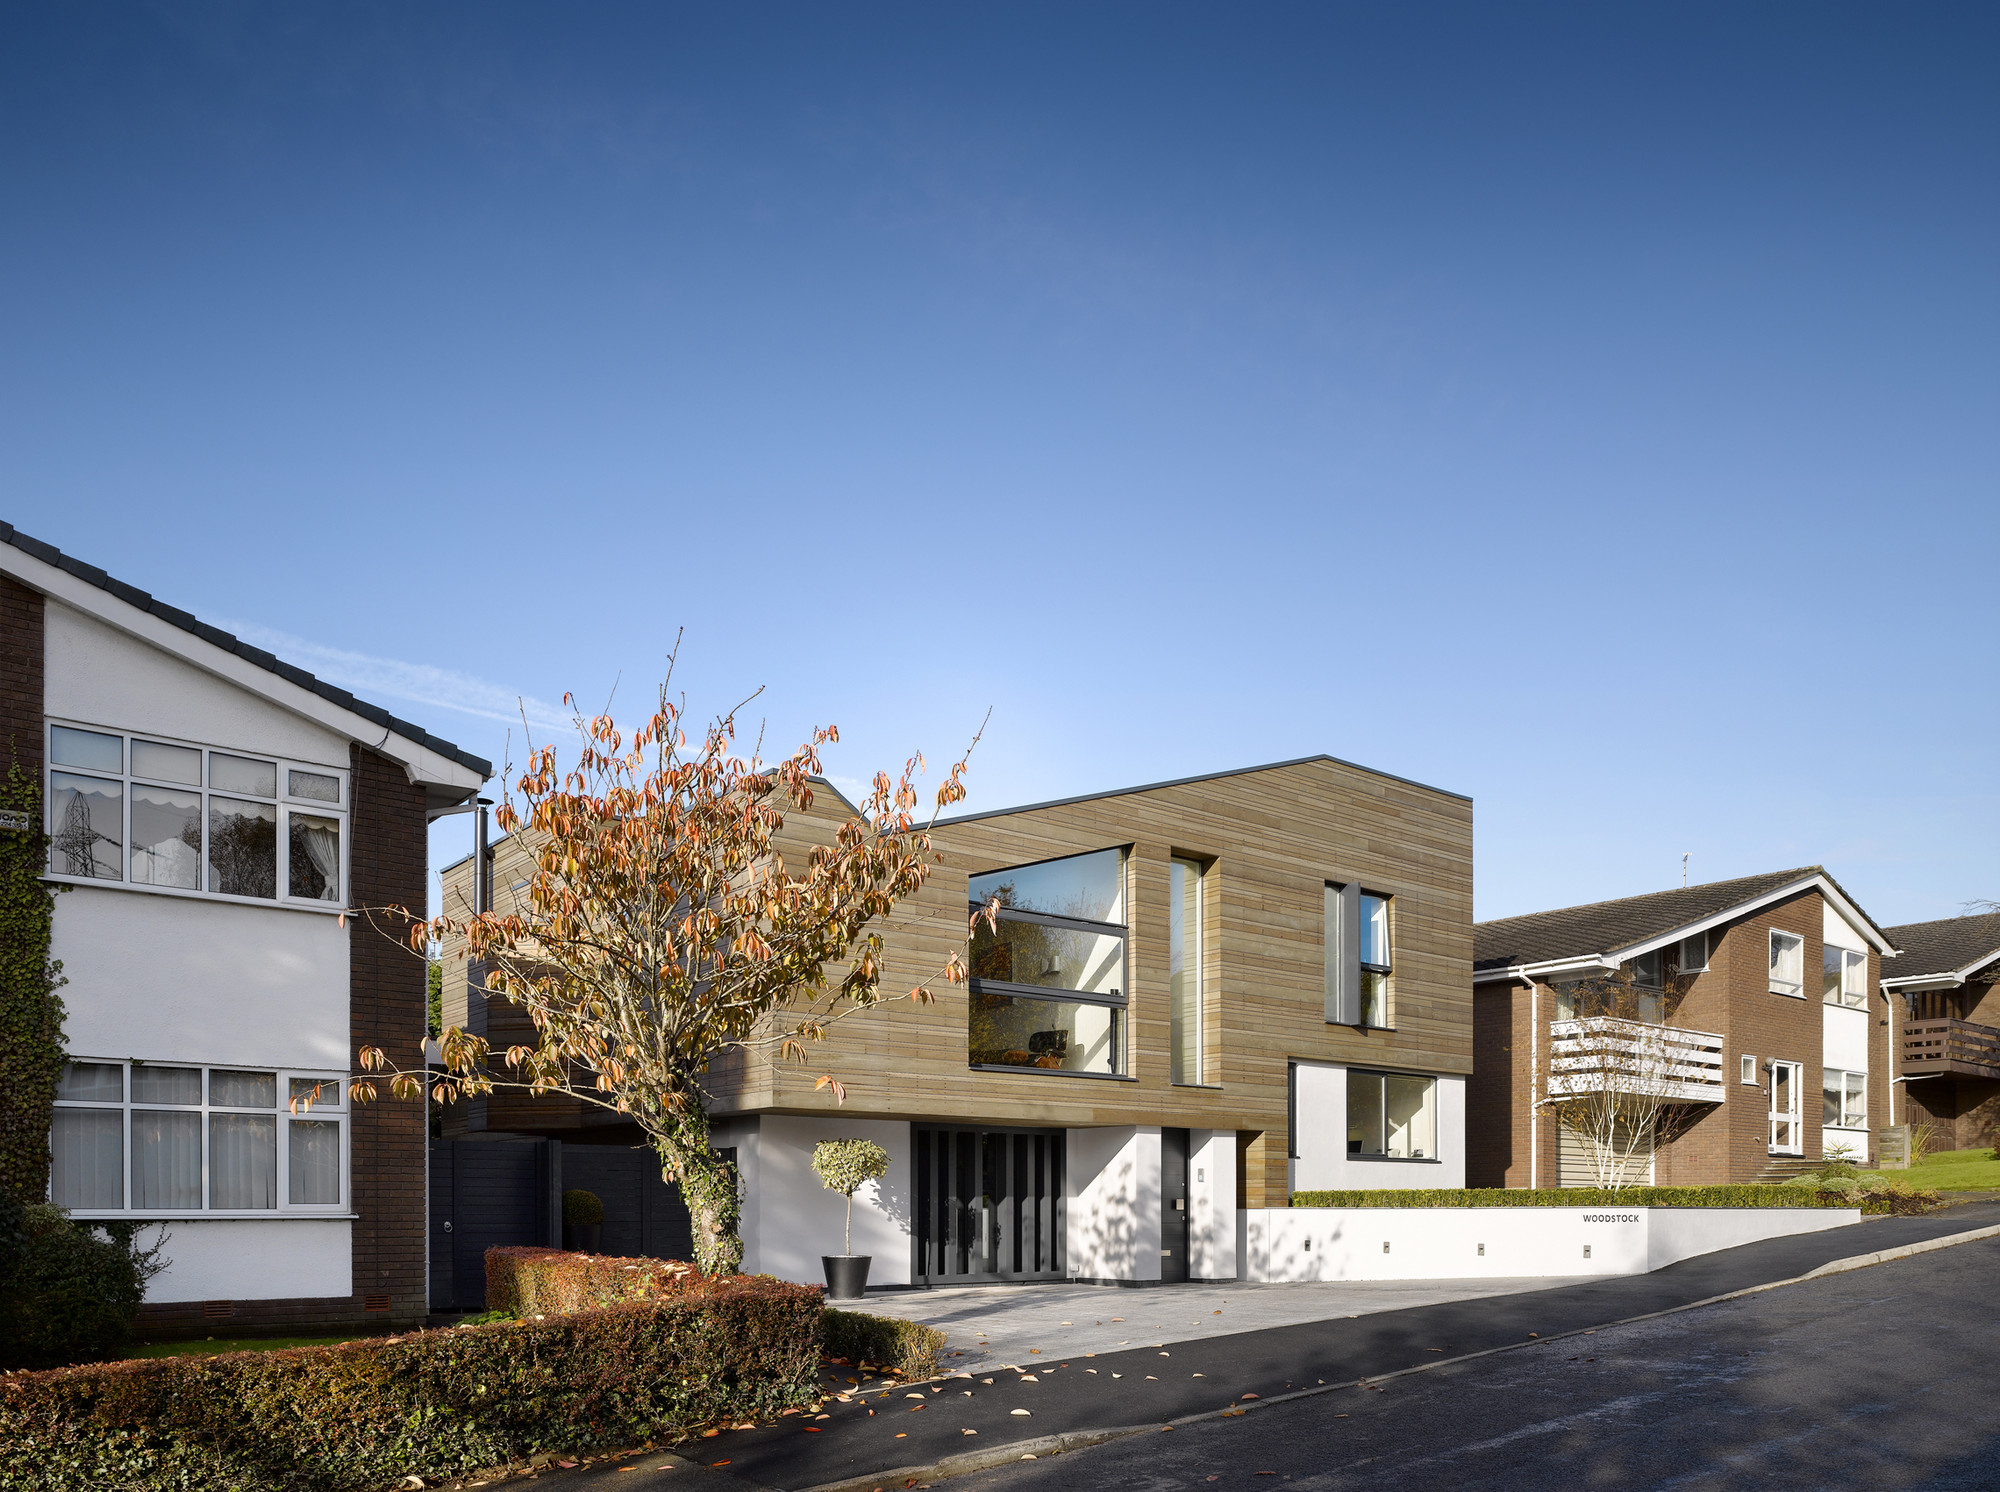 House 1005 / Stephenson ISA Studio, Courtesy of Stephenson ISA Studio